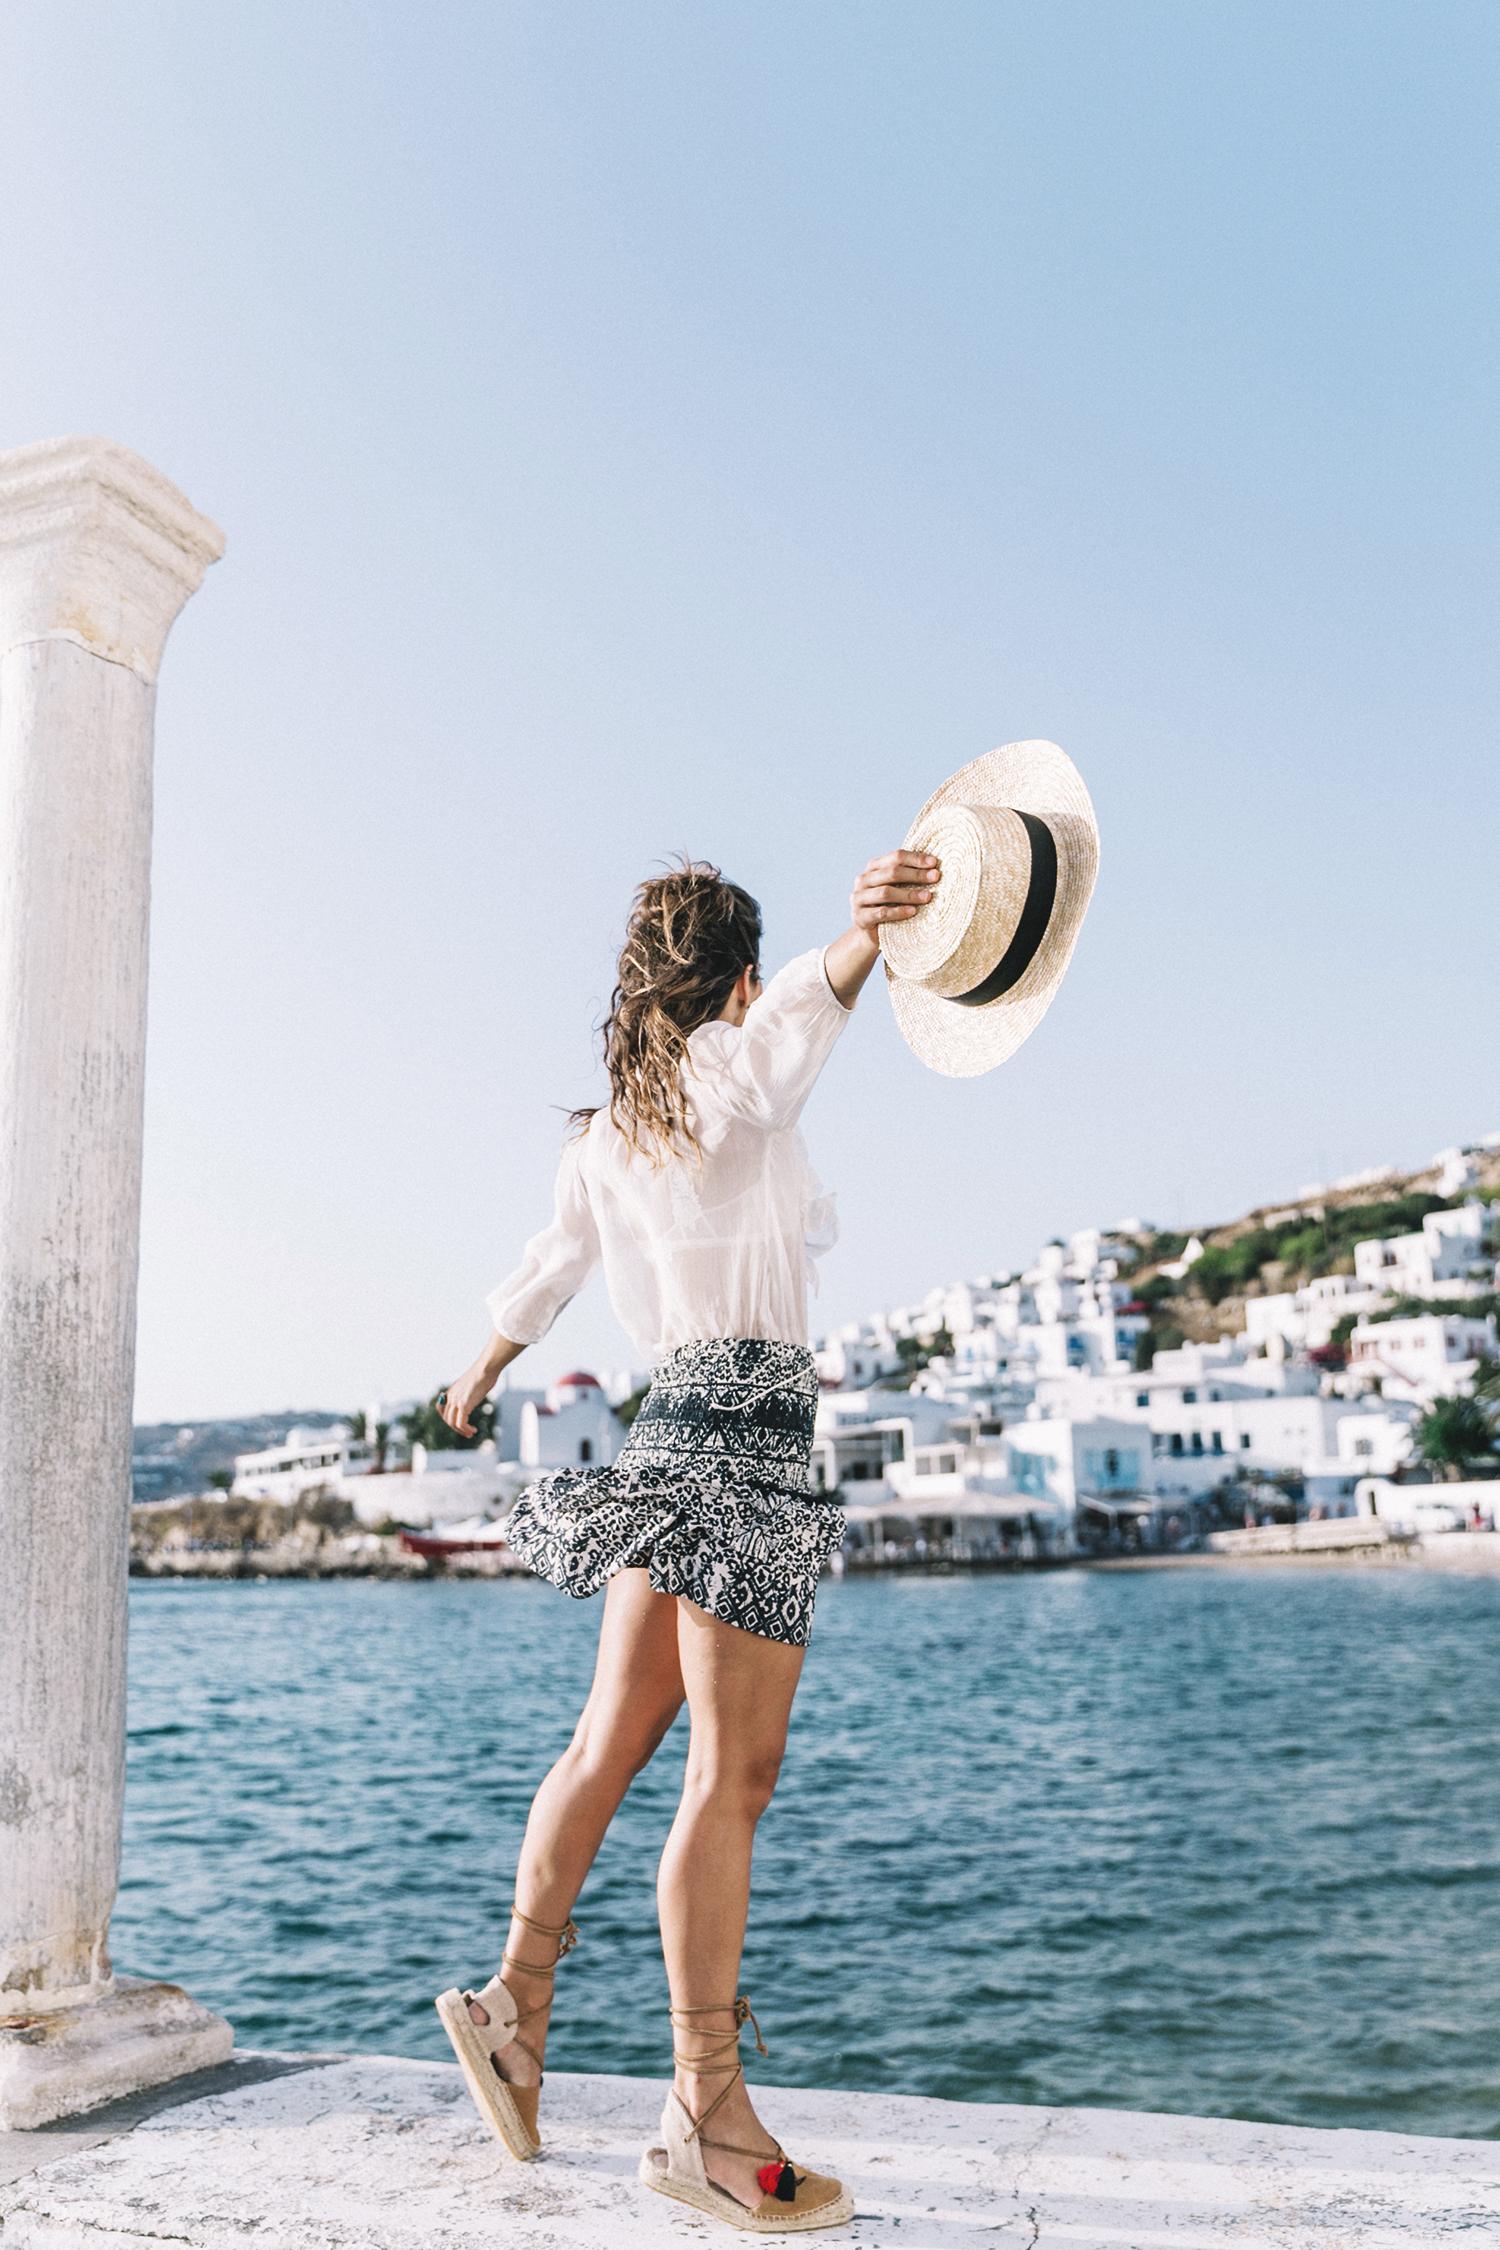 Lace_up_Blouse-Ralph_Lauren-Soludos_Espadrilles-Soludos_Escapes-Skirt-Straw_Hat-Canotier-Lack_Of_Color-Street_Style-Mykonos-Greece-Collage_Vintage-87